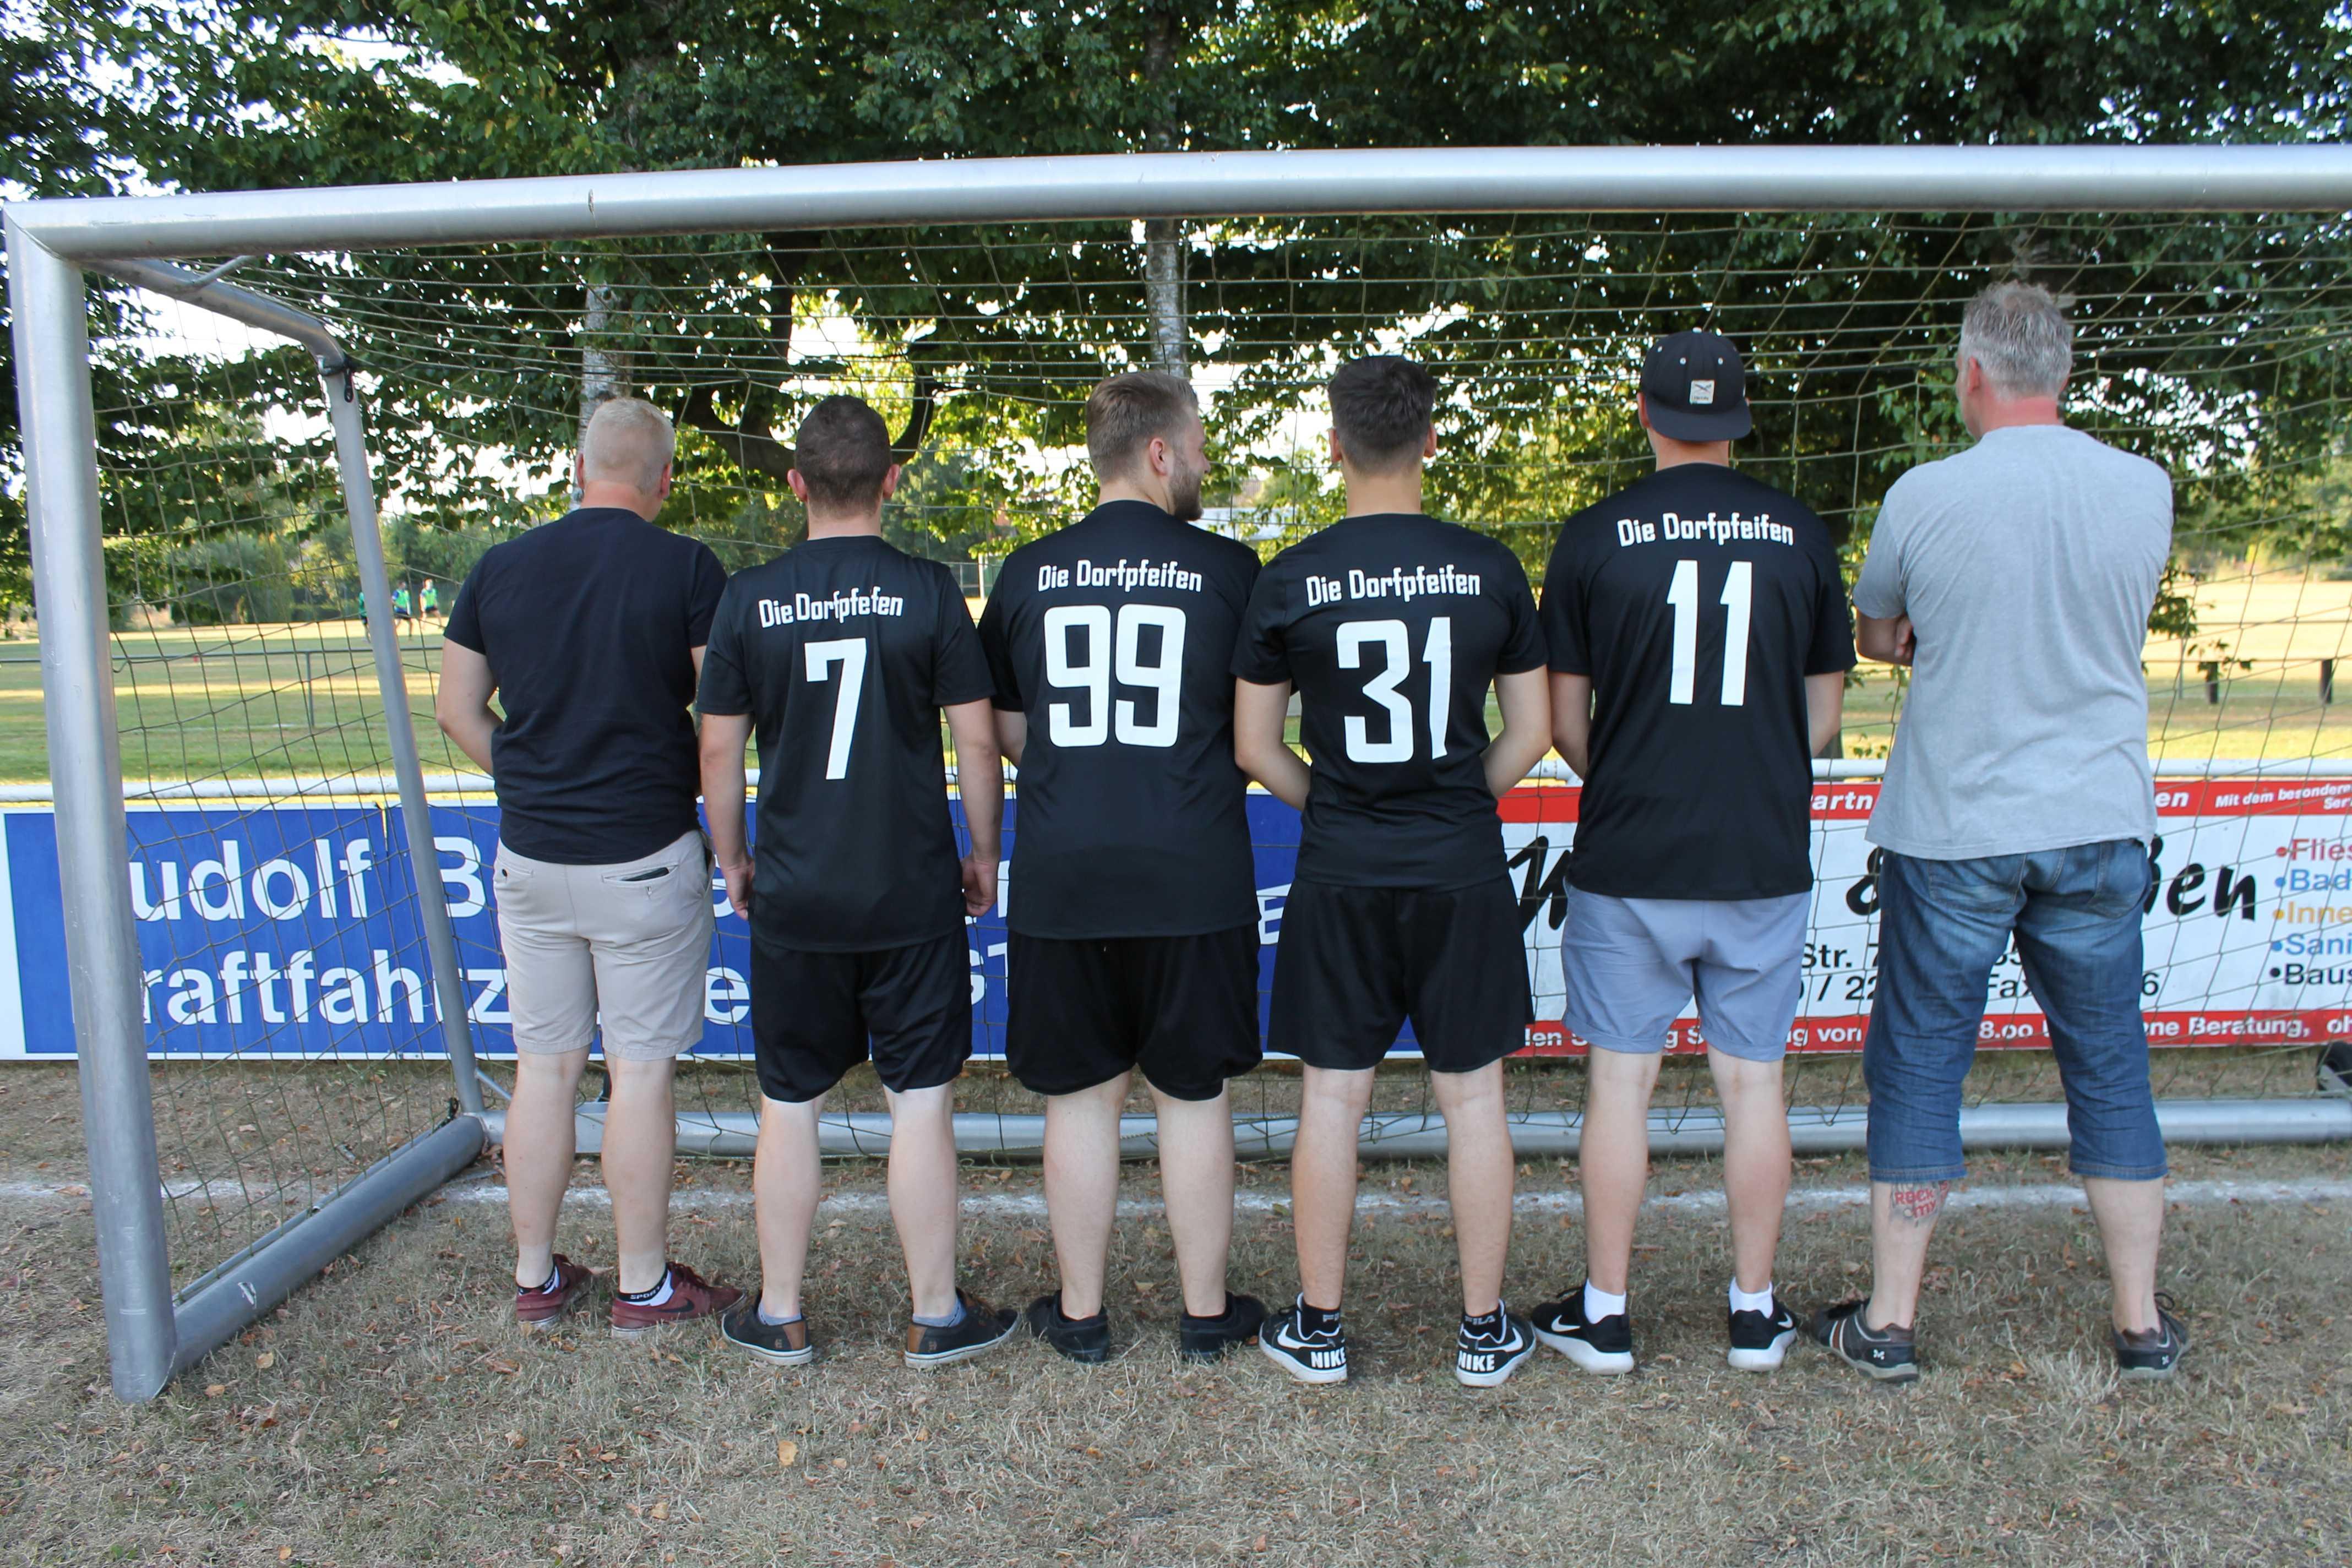 2018-07-27 Sportwoche - Flunkyball Turnier (35)